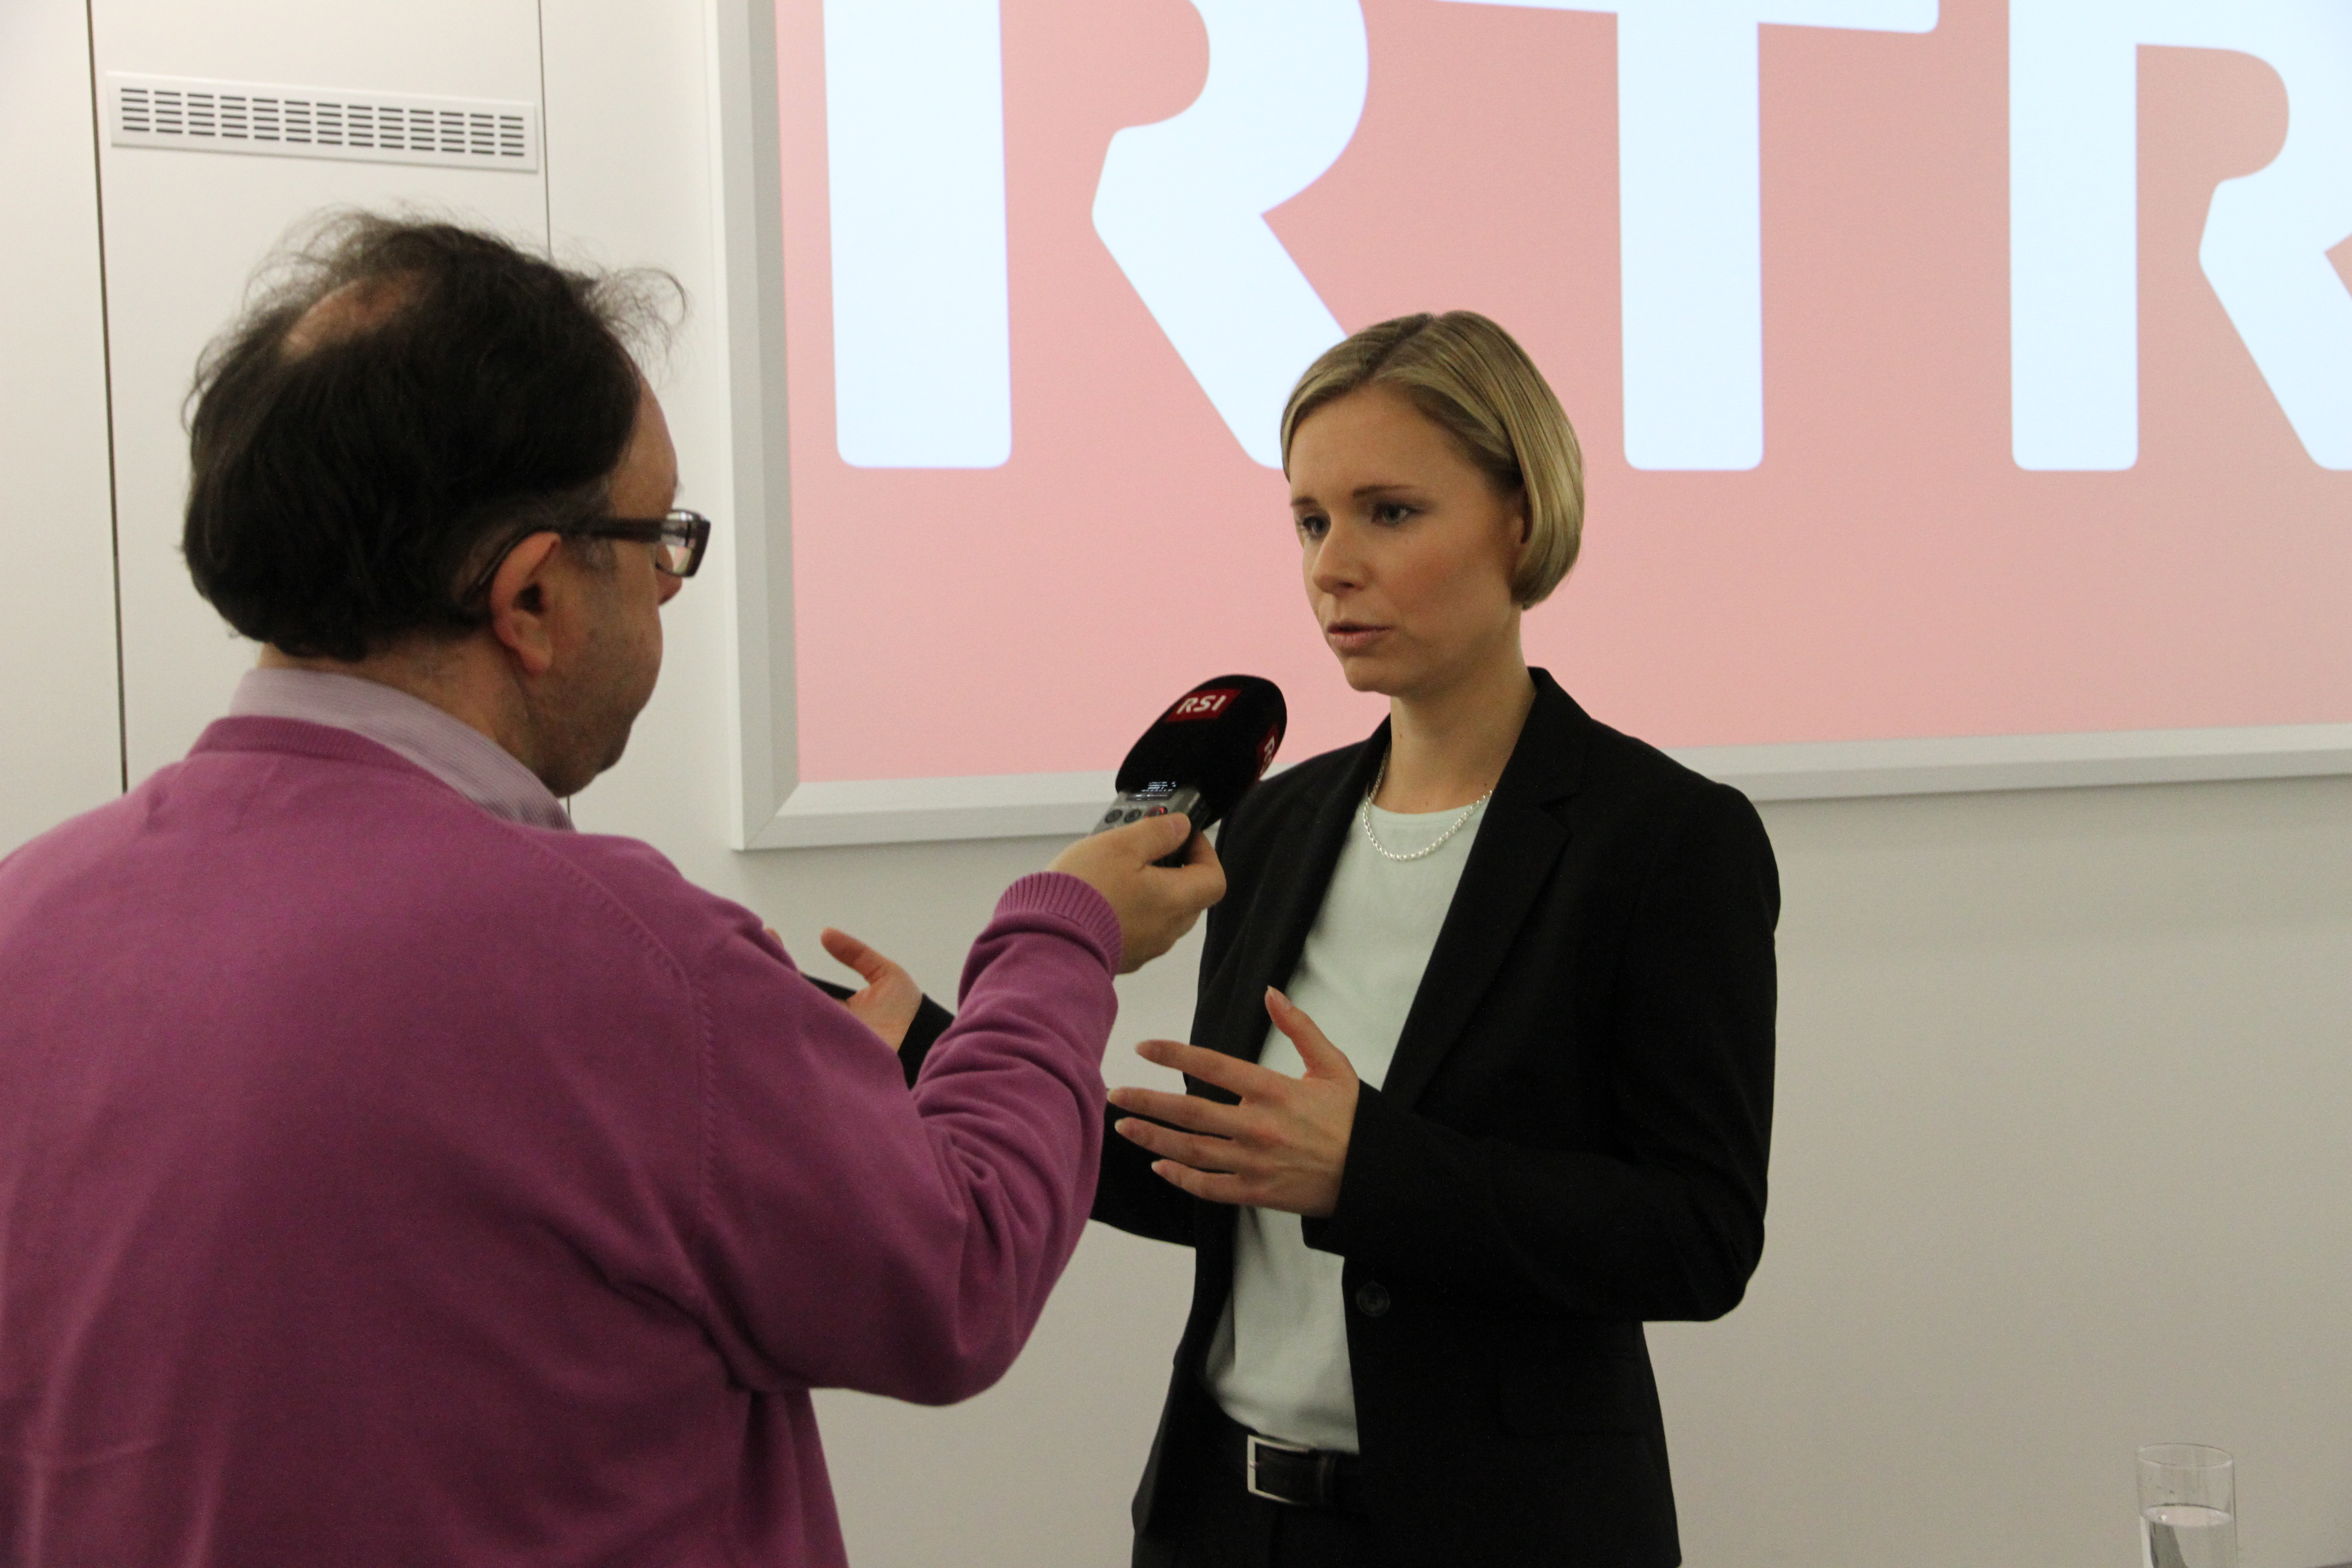 Ladina Heimgartner en discurs cun il redactur da RSI, Roberto Scolla.